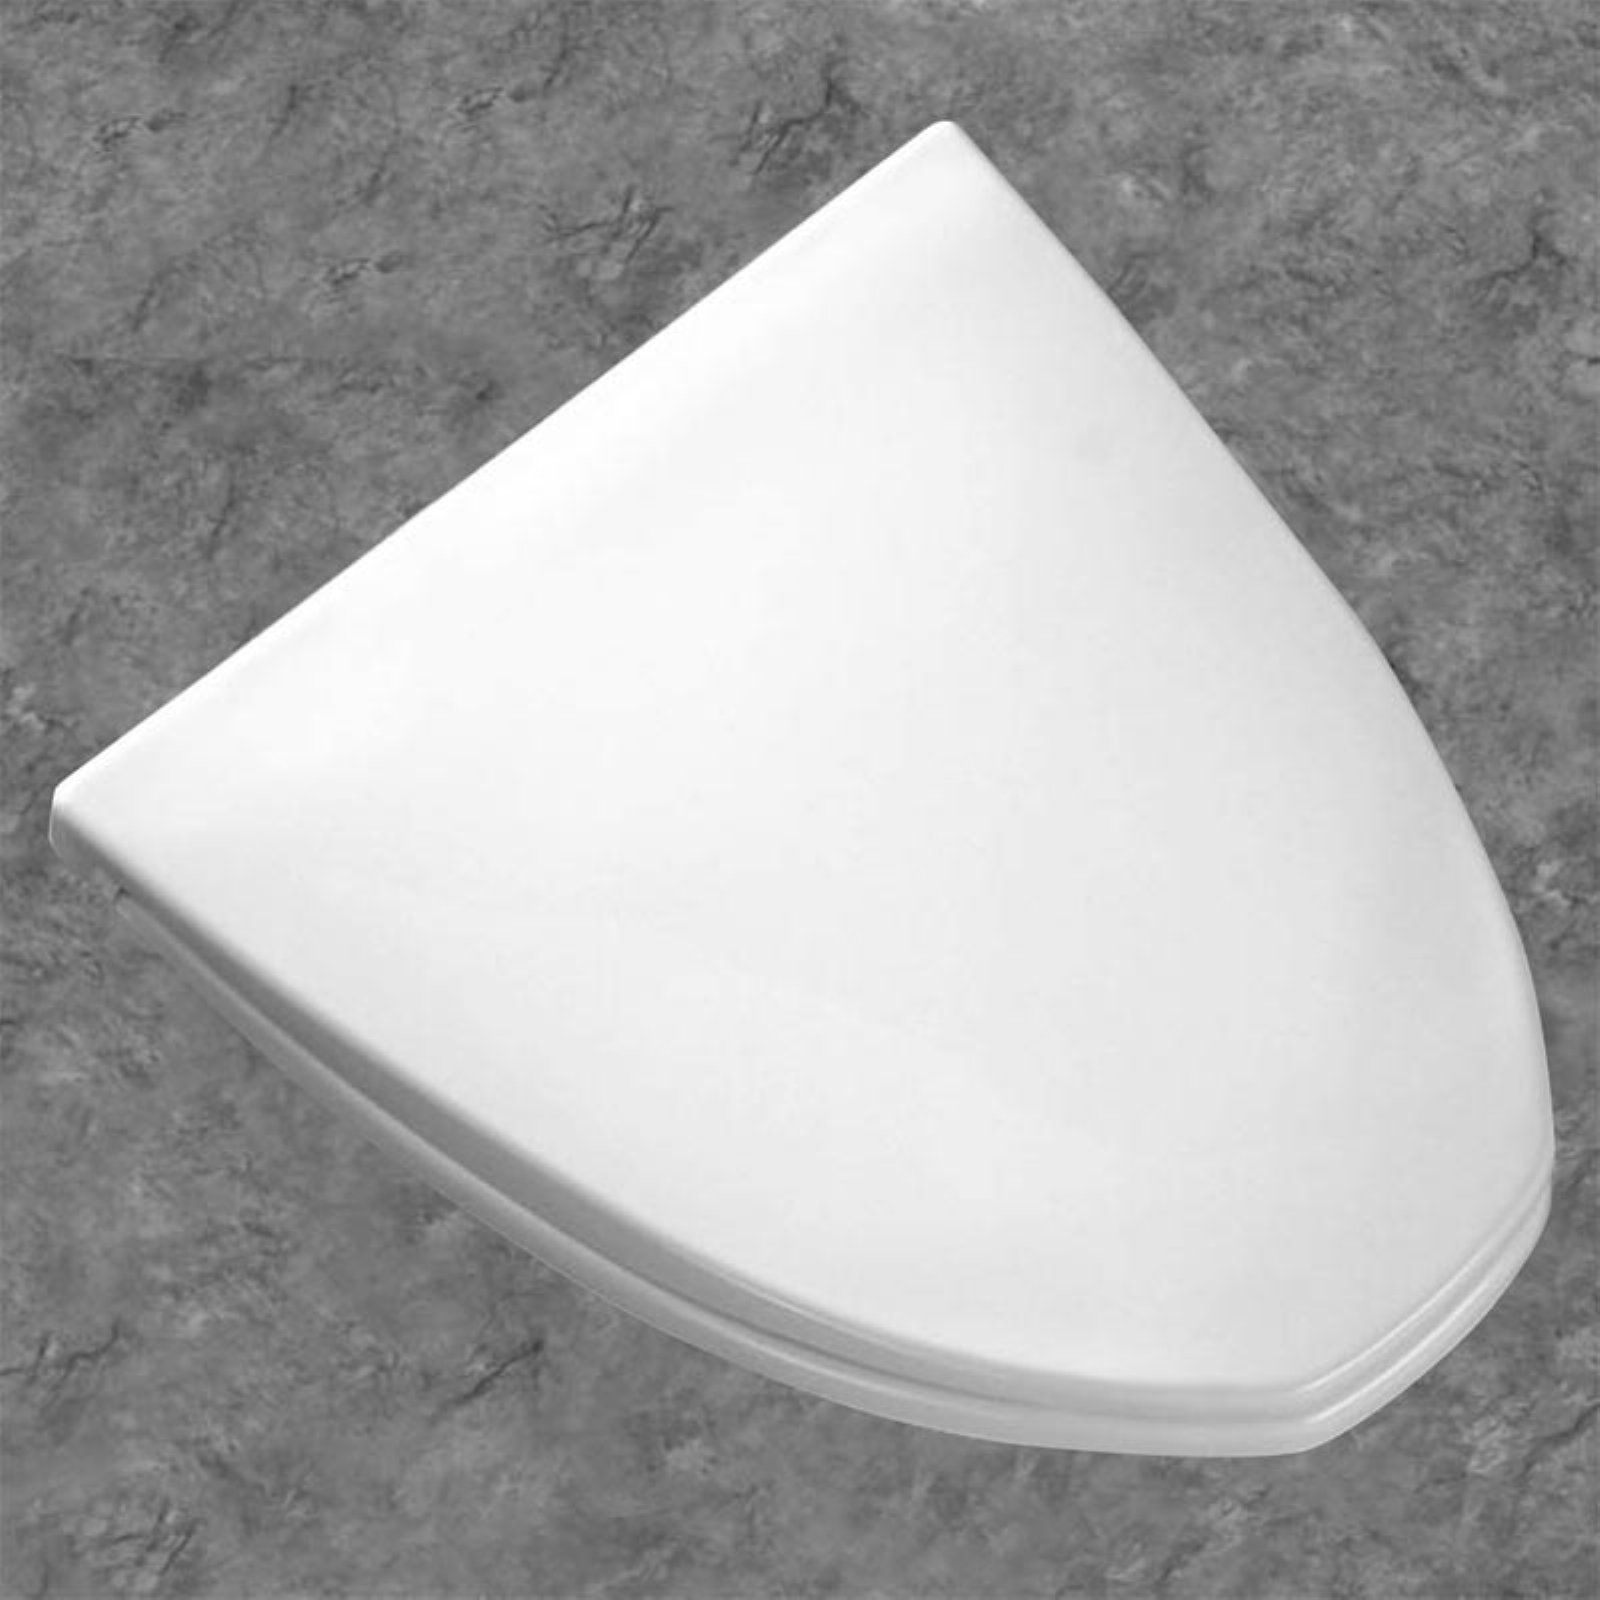 Bemis LC212 for Elongated American Standard Toilet Seat